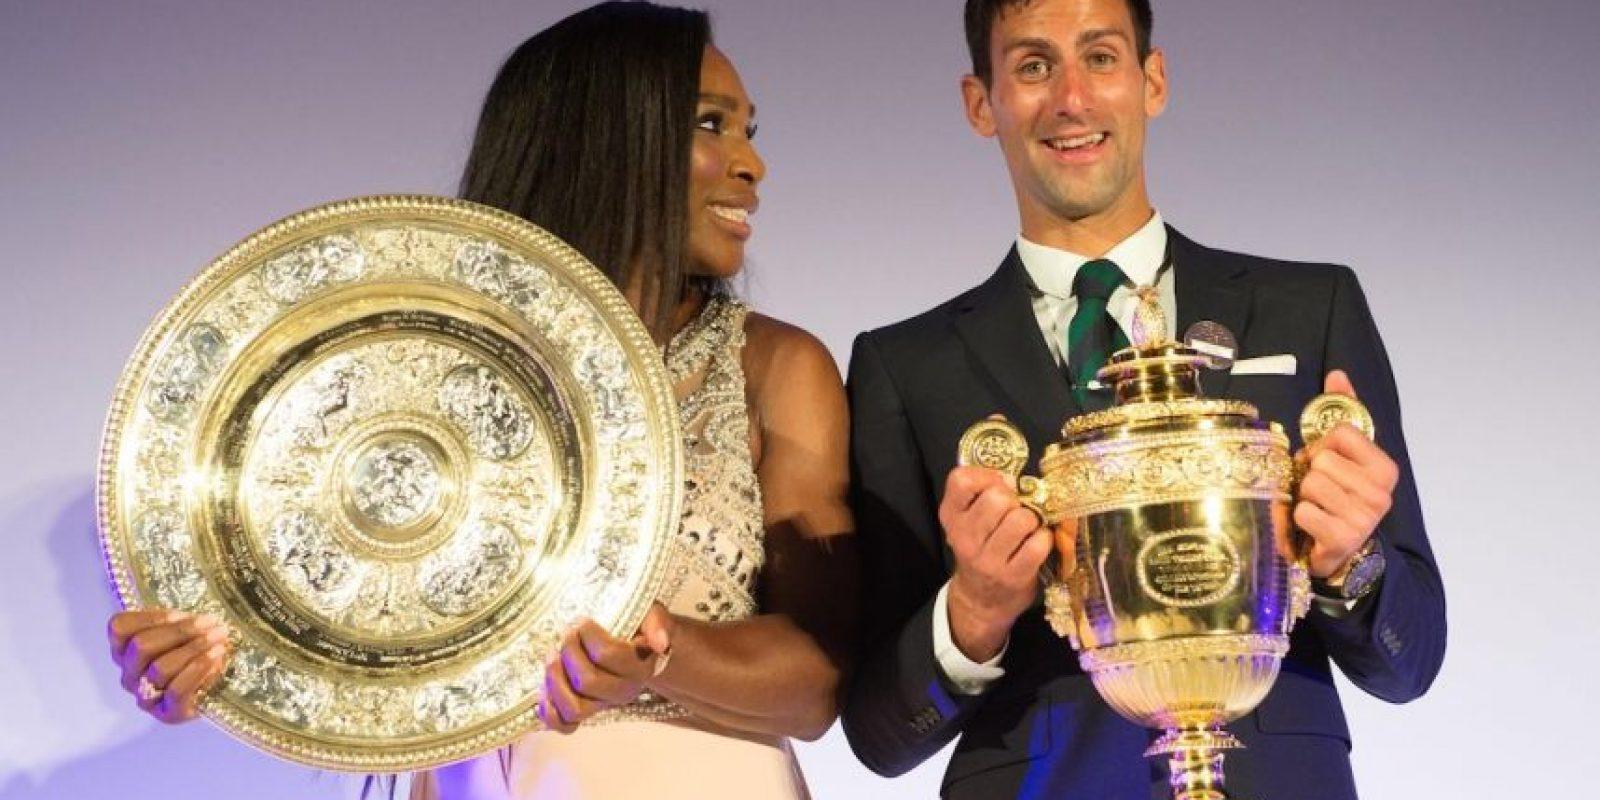 Serena Williams y Novak Djokovic, los campeones de Wimbledon 2015. Foto:Vía facebook.com/wimbledon